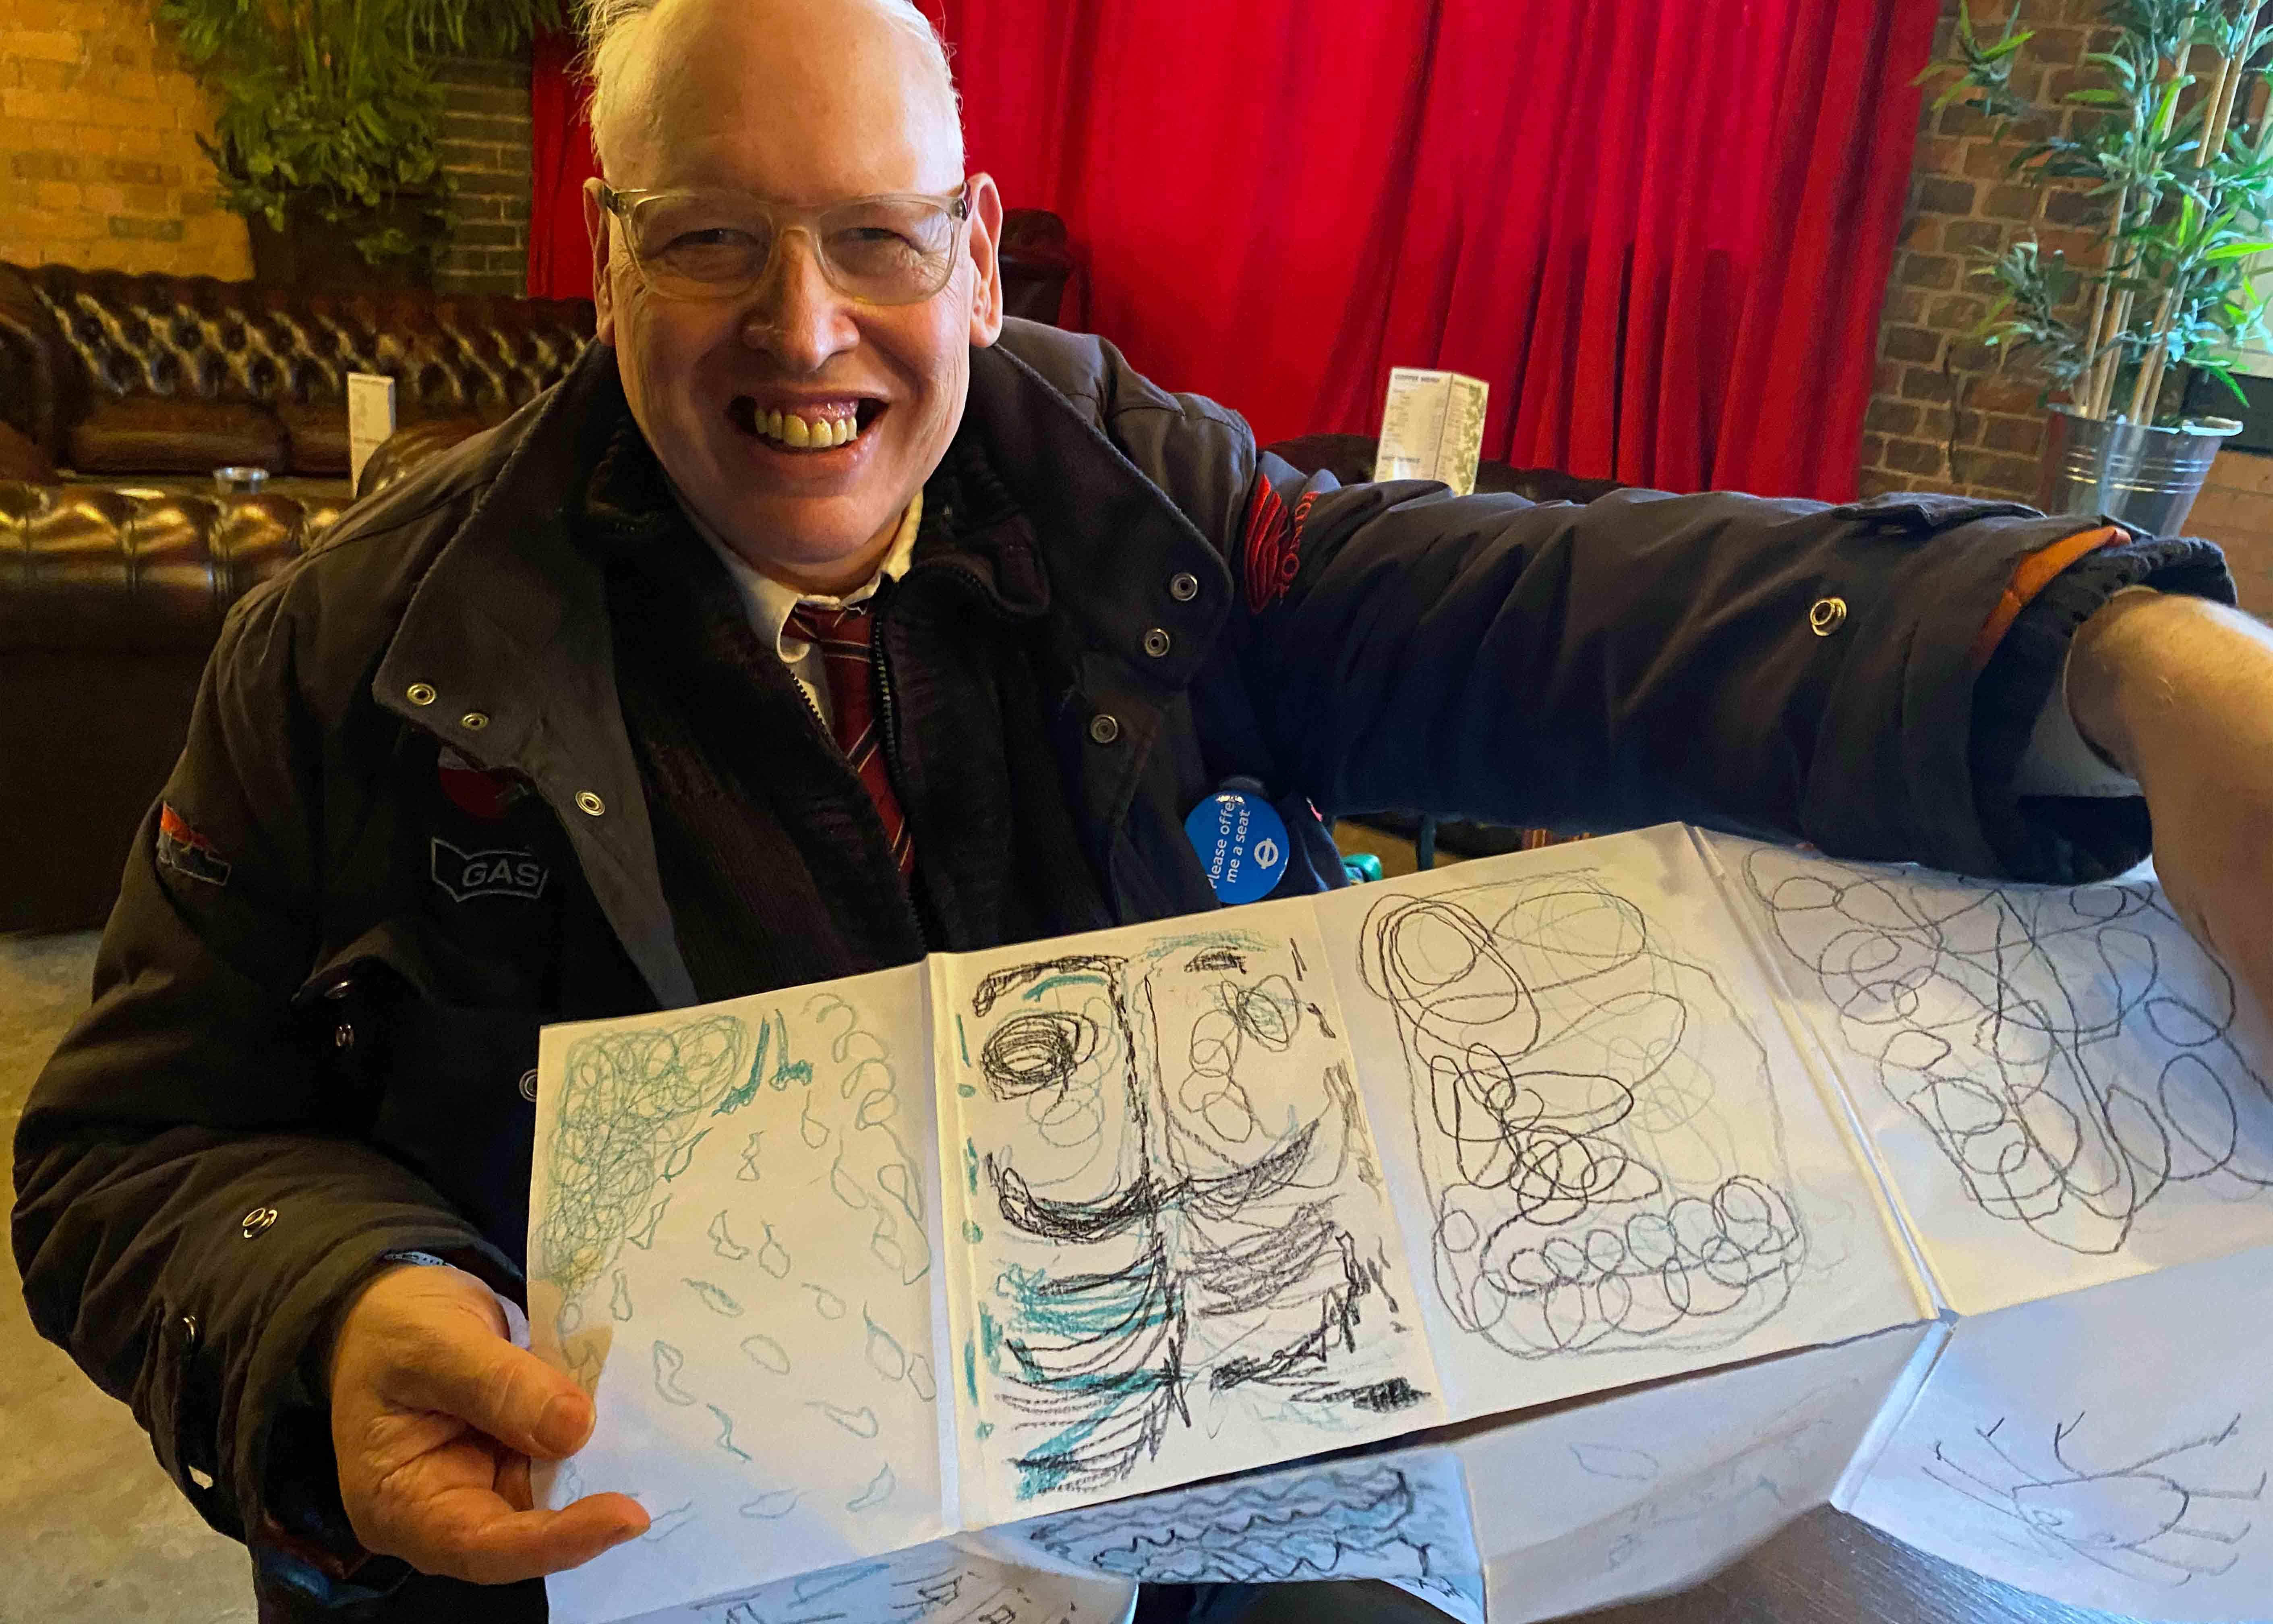 Man holding drawing